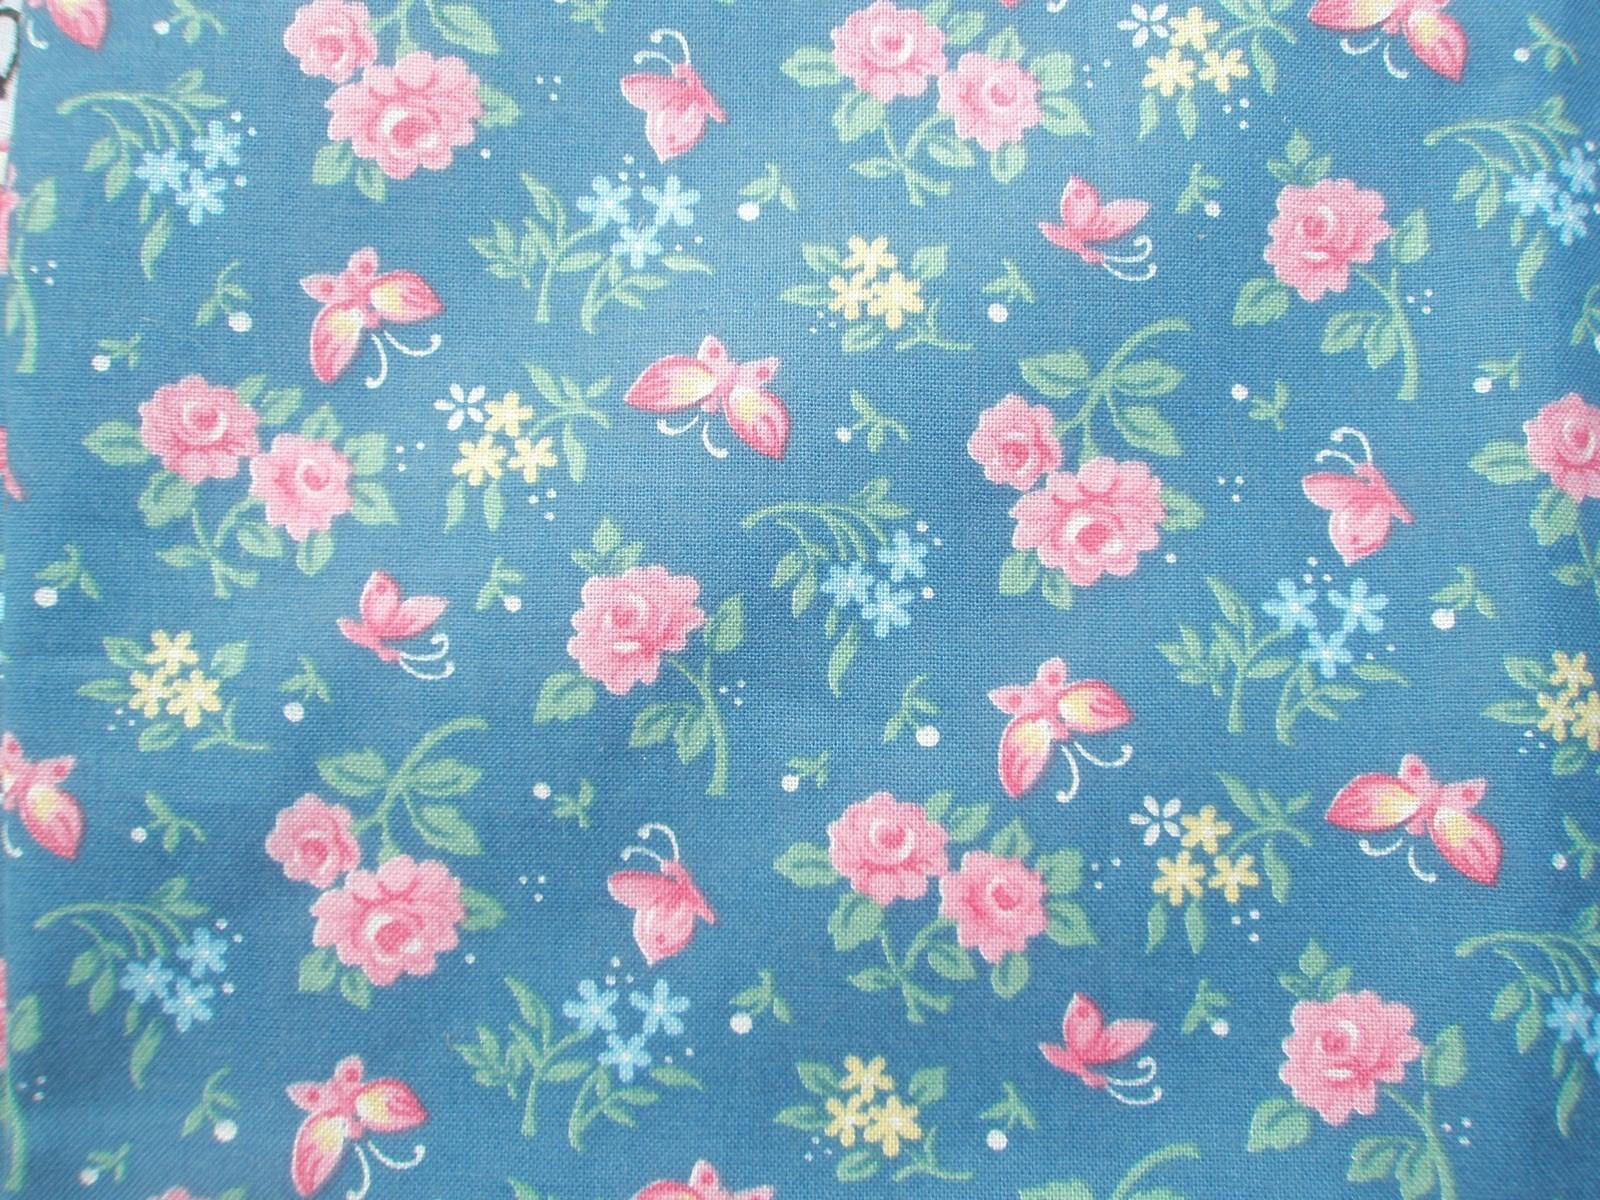 Awesome Girly Free Wallpaper - WallpaperSafari